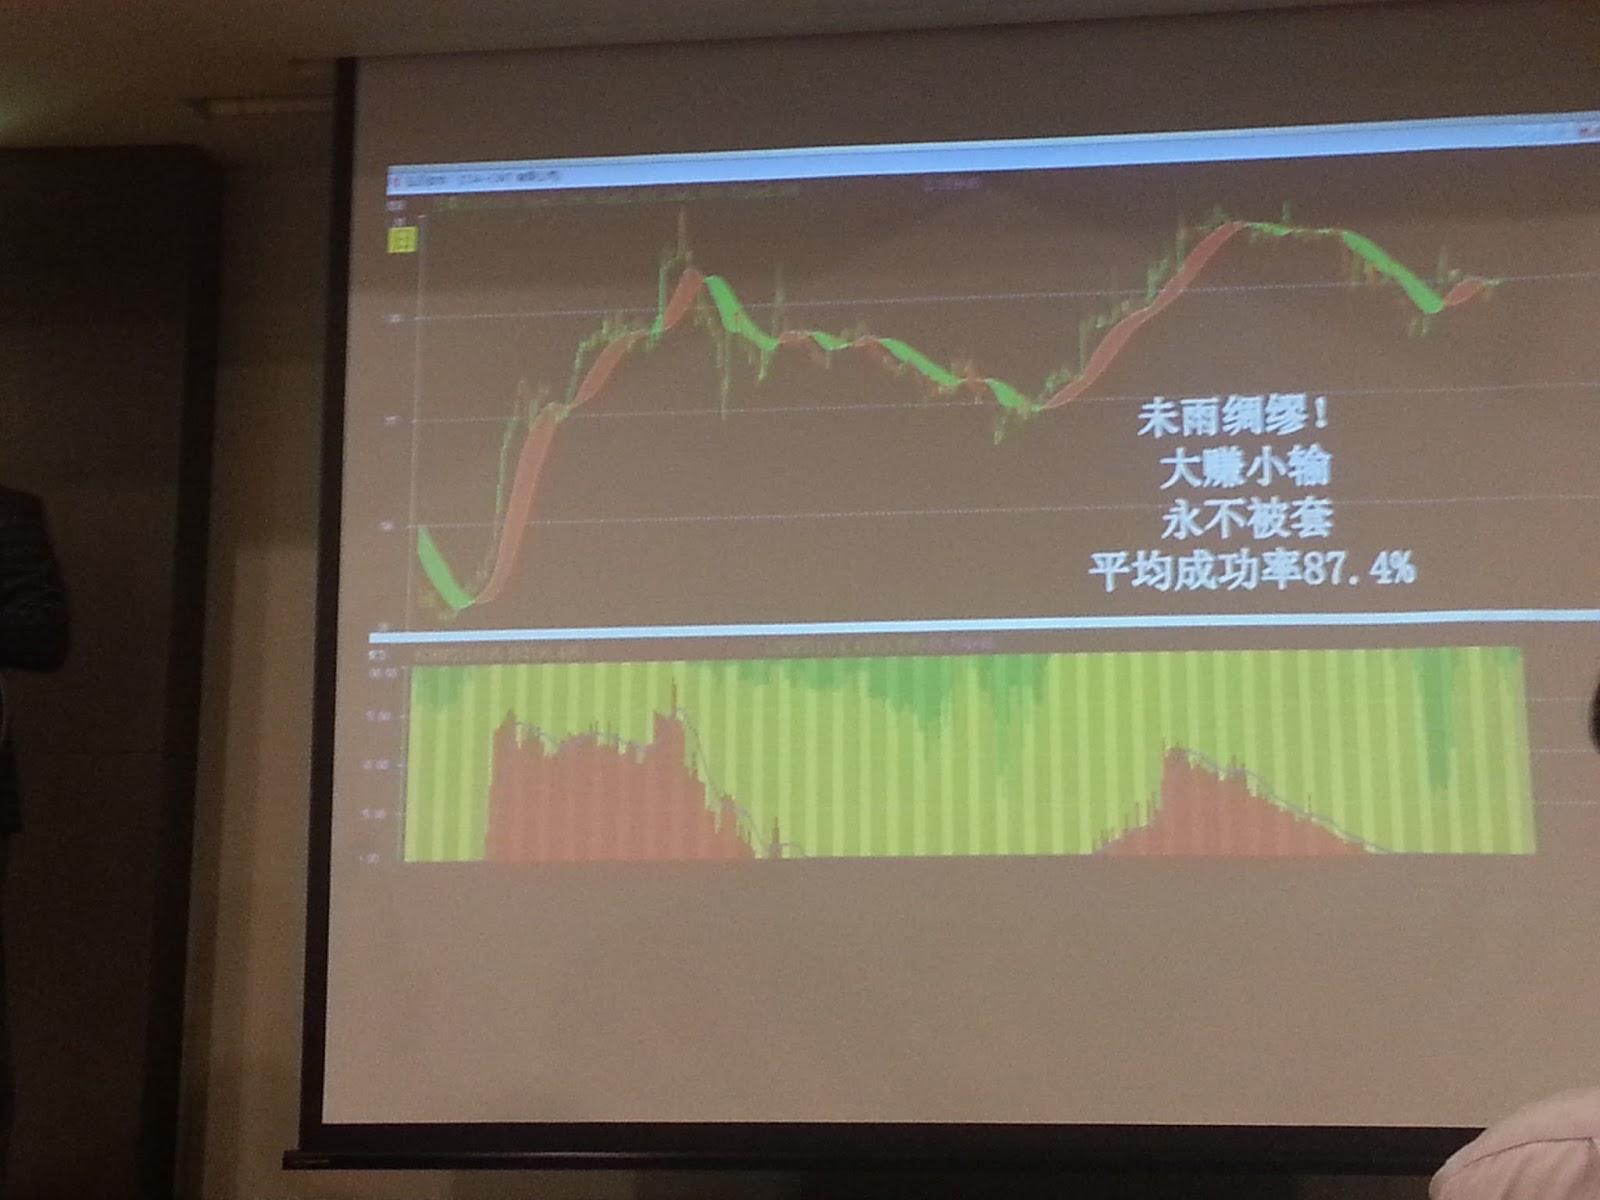 Dbs bank forex trading